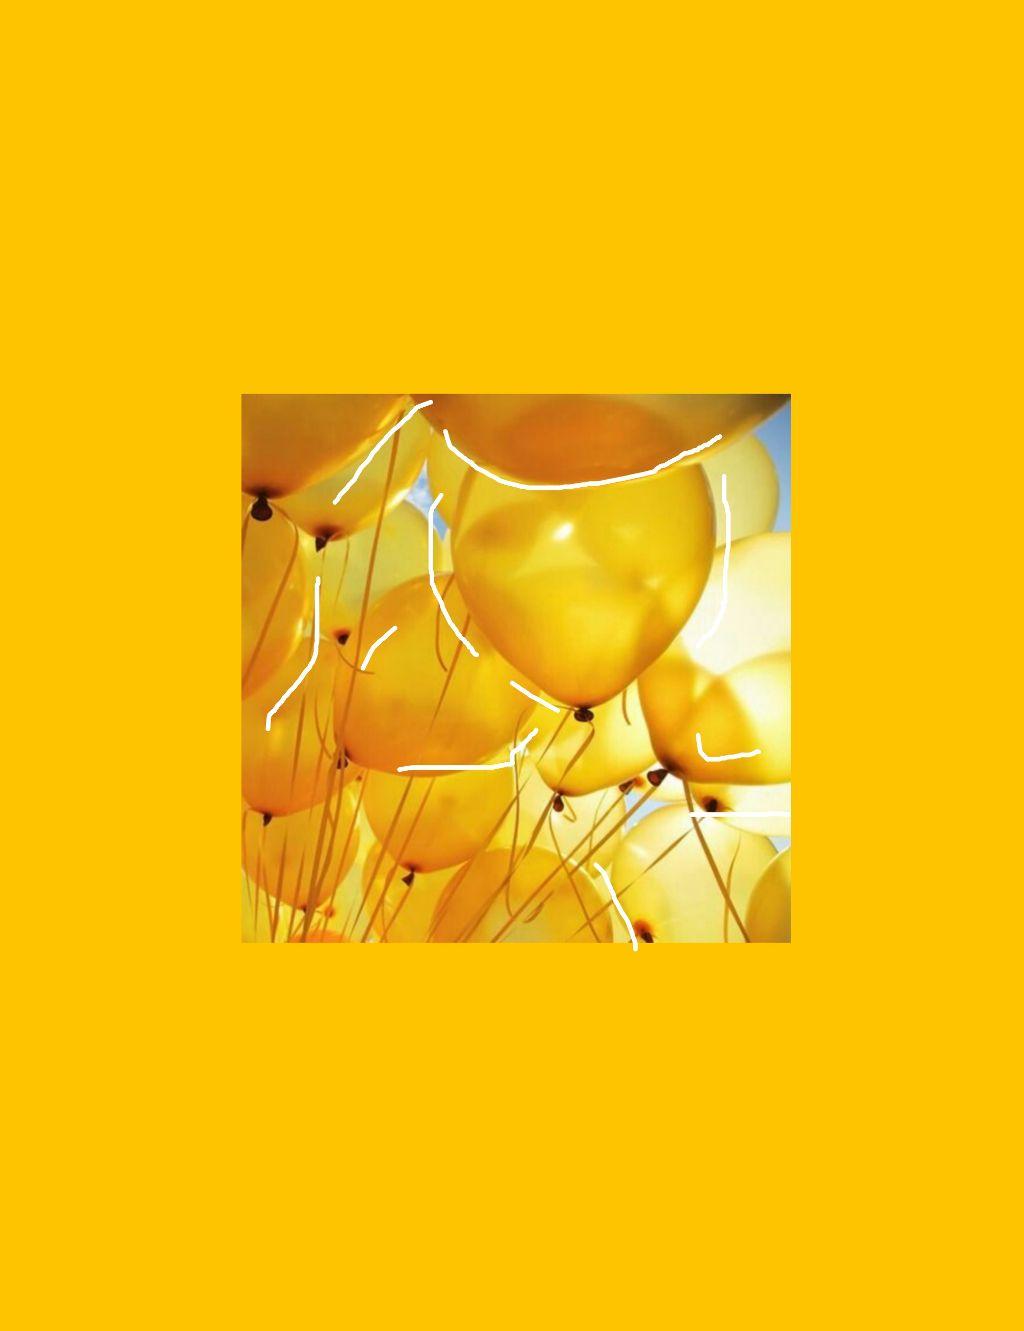 Yellow Yellowwallpaper Walpaper Aesthetic Balloons Yell